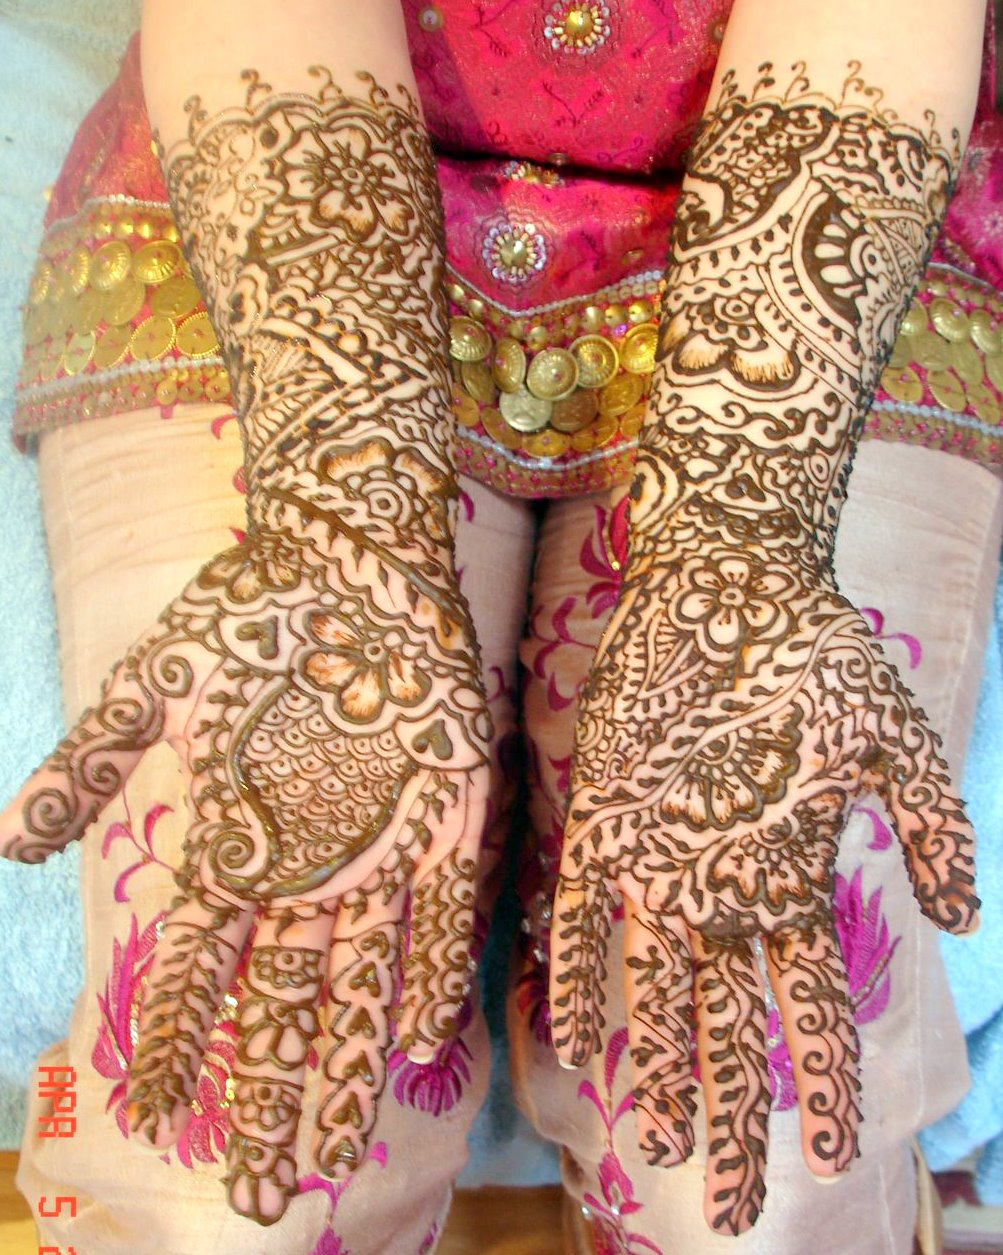 Mehndi Designs For Engagement : Mehndi designs indian design for wedding